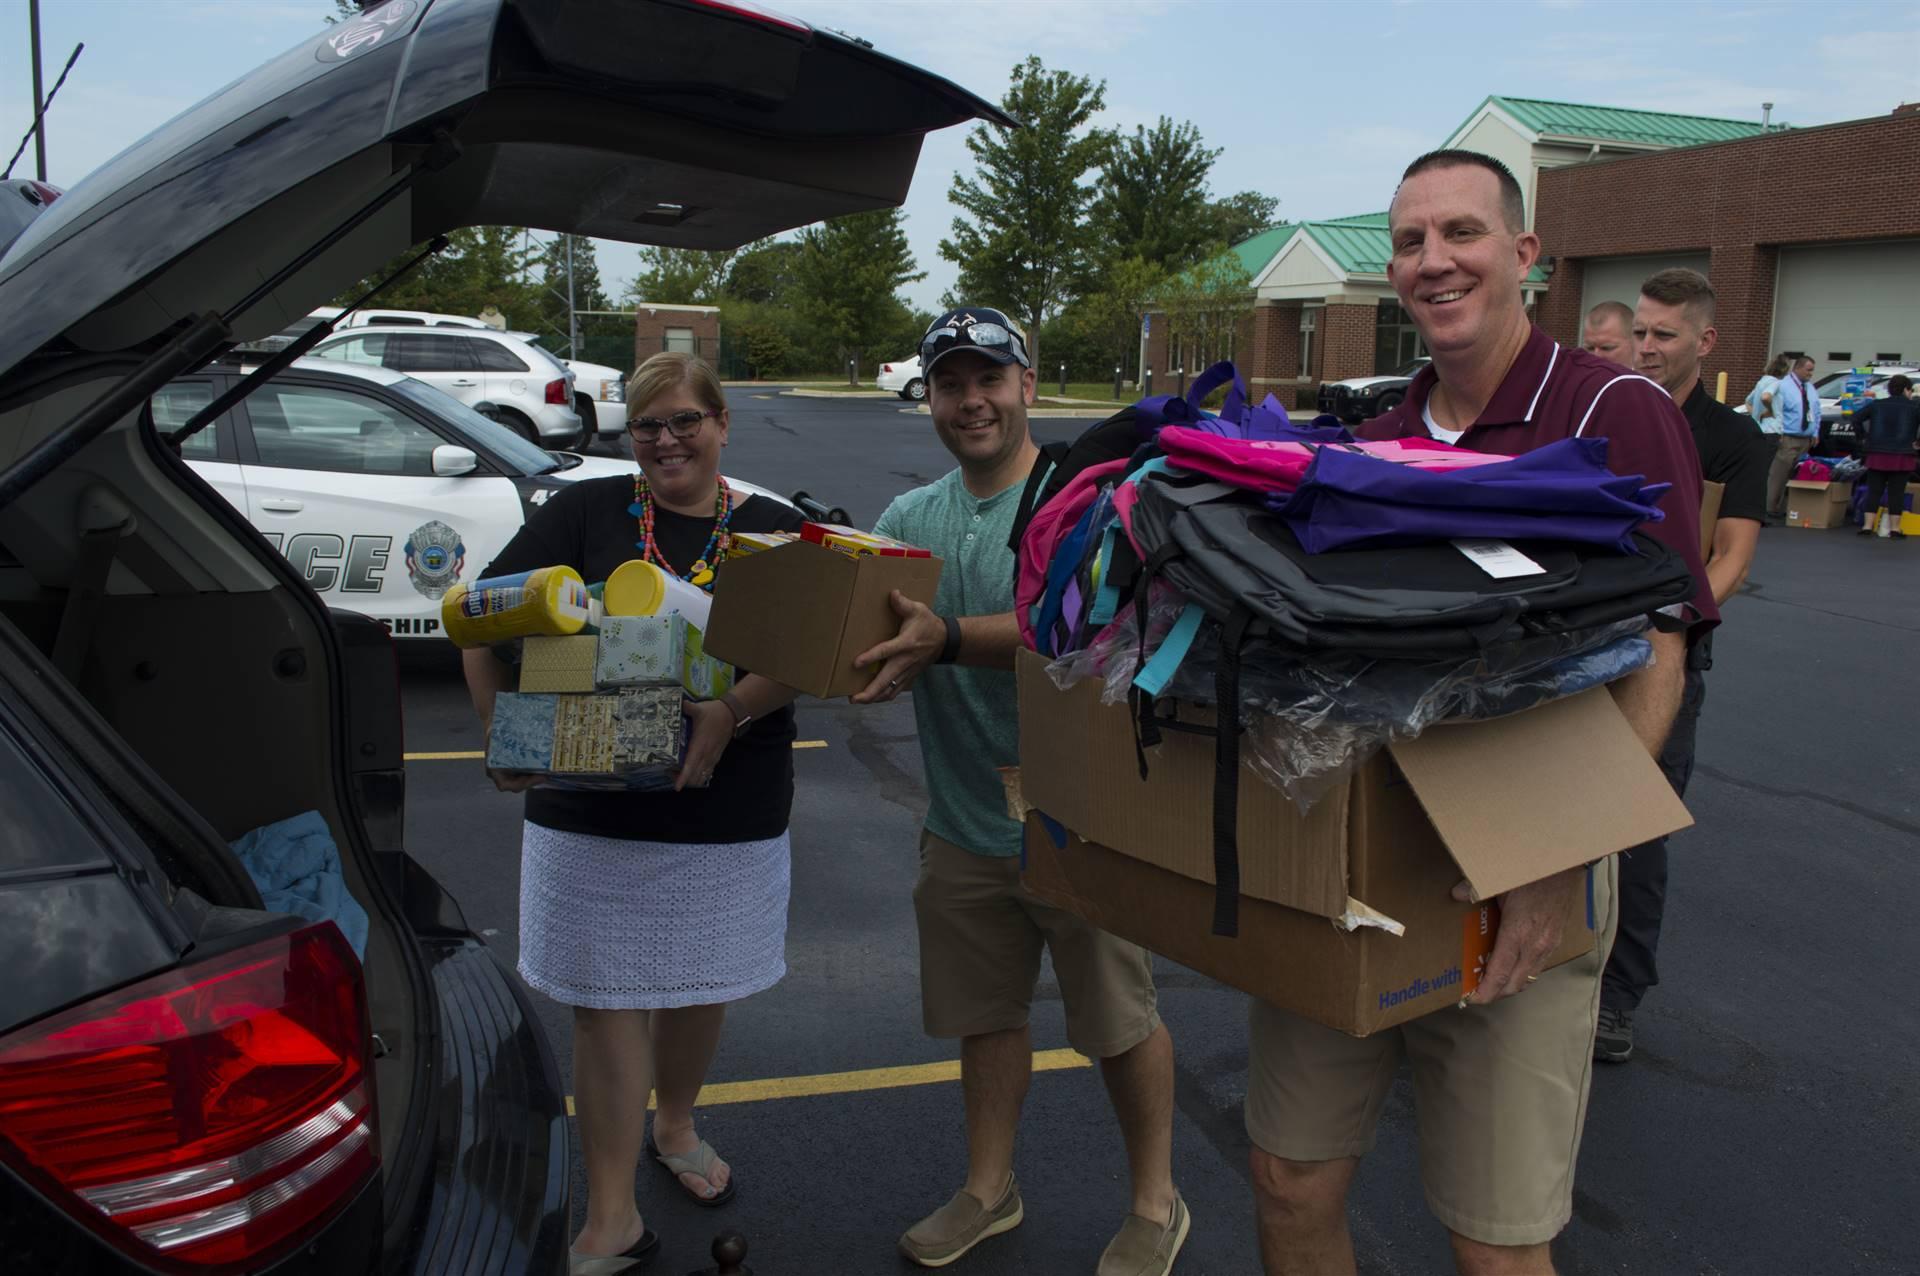 Principals picking up school supplies